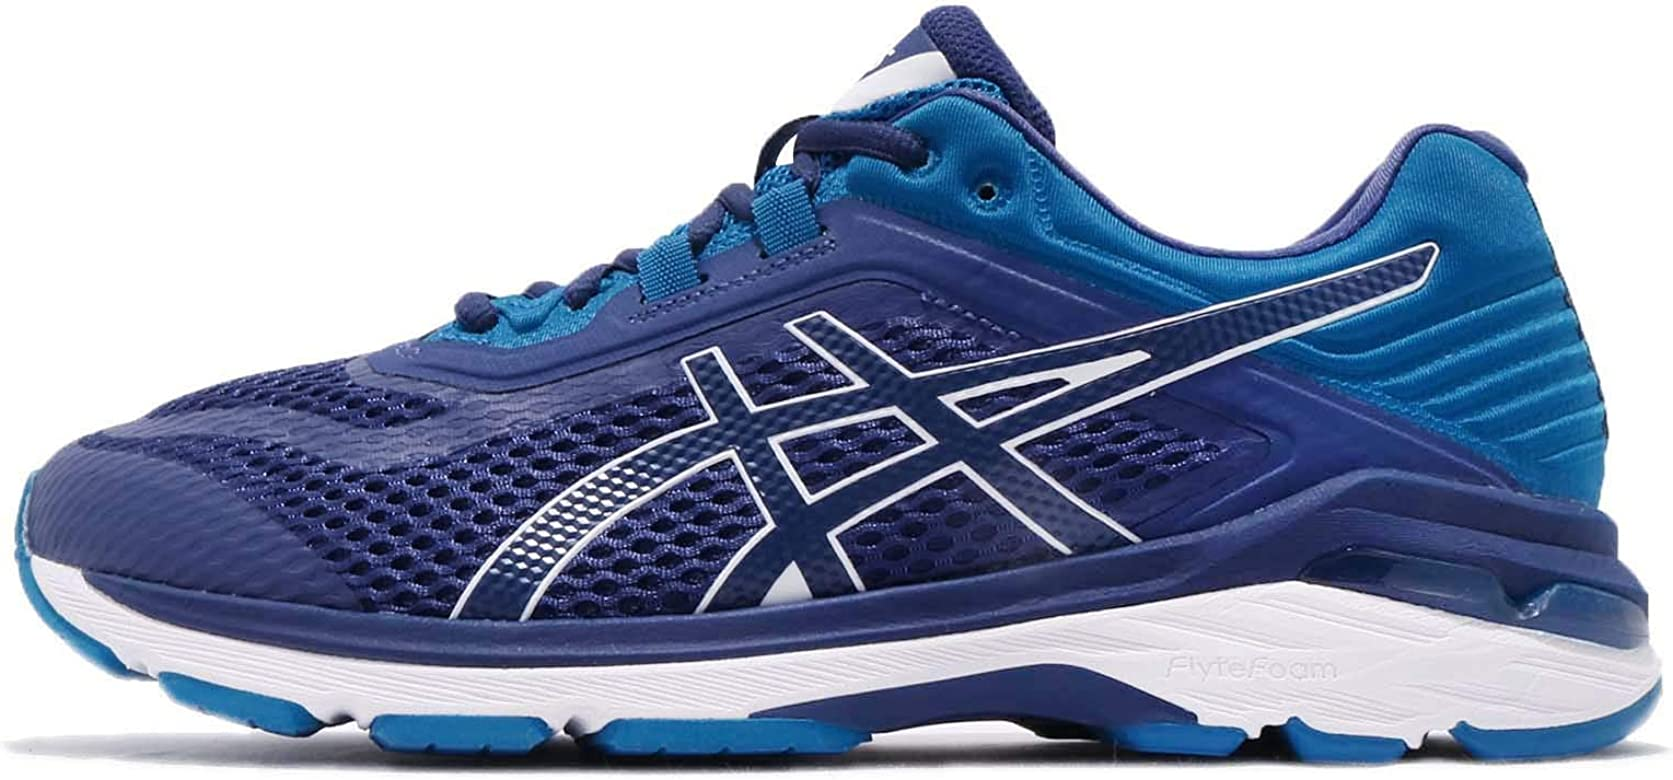 Asics GT-2000 6 Zapatillas para Correr (2E Width) - AW18-46: Amazon.es: Zapatos y complementos